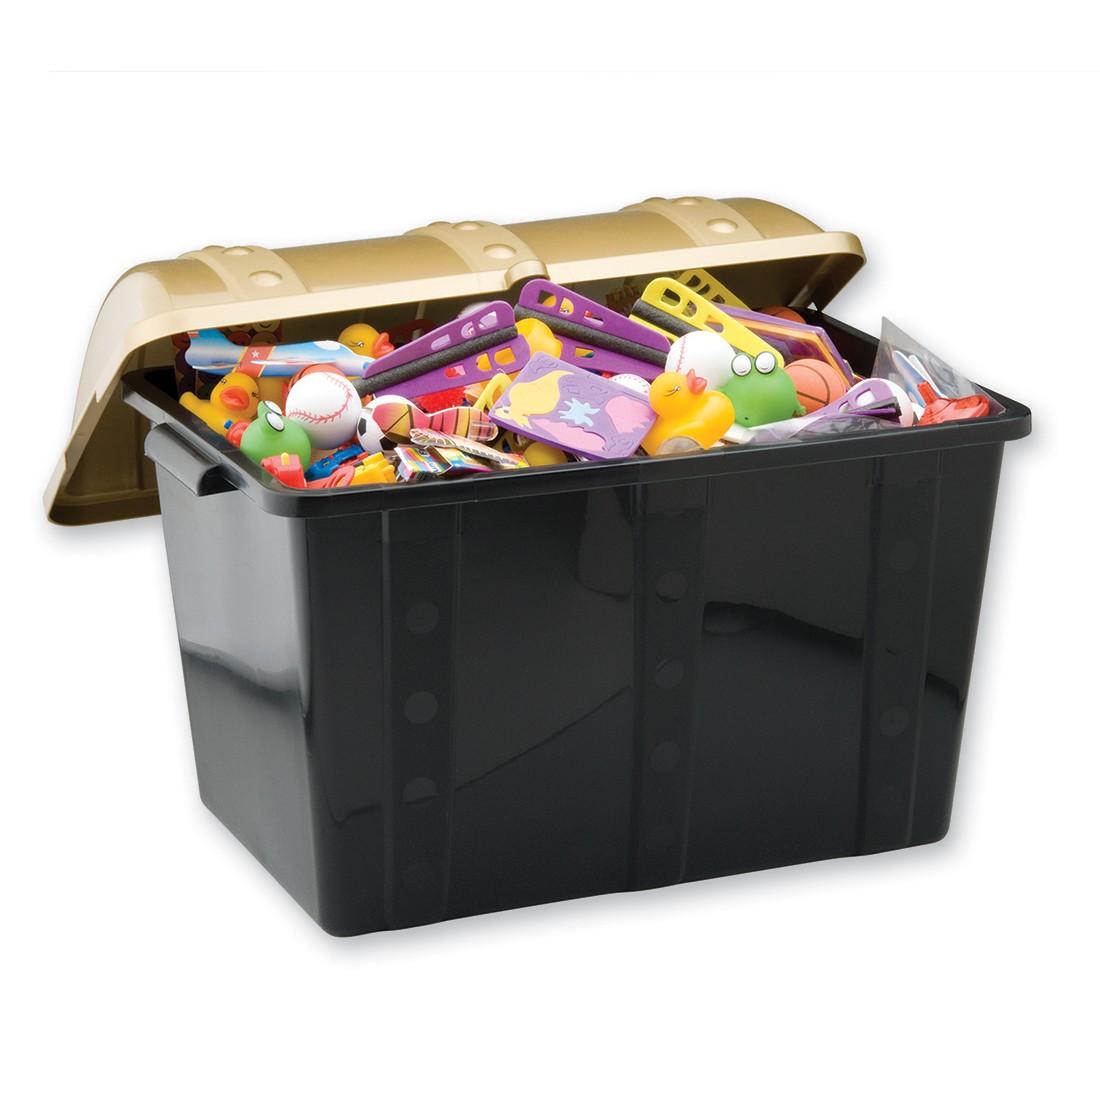 Super Sized Plastic Treasure Chest [image]